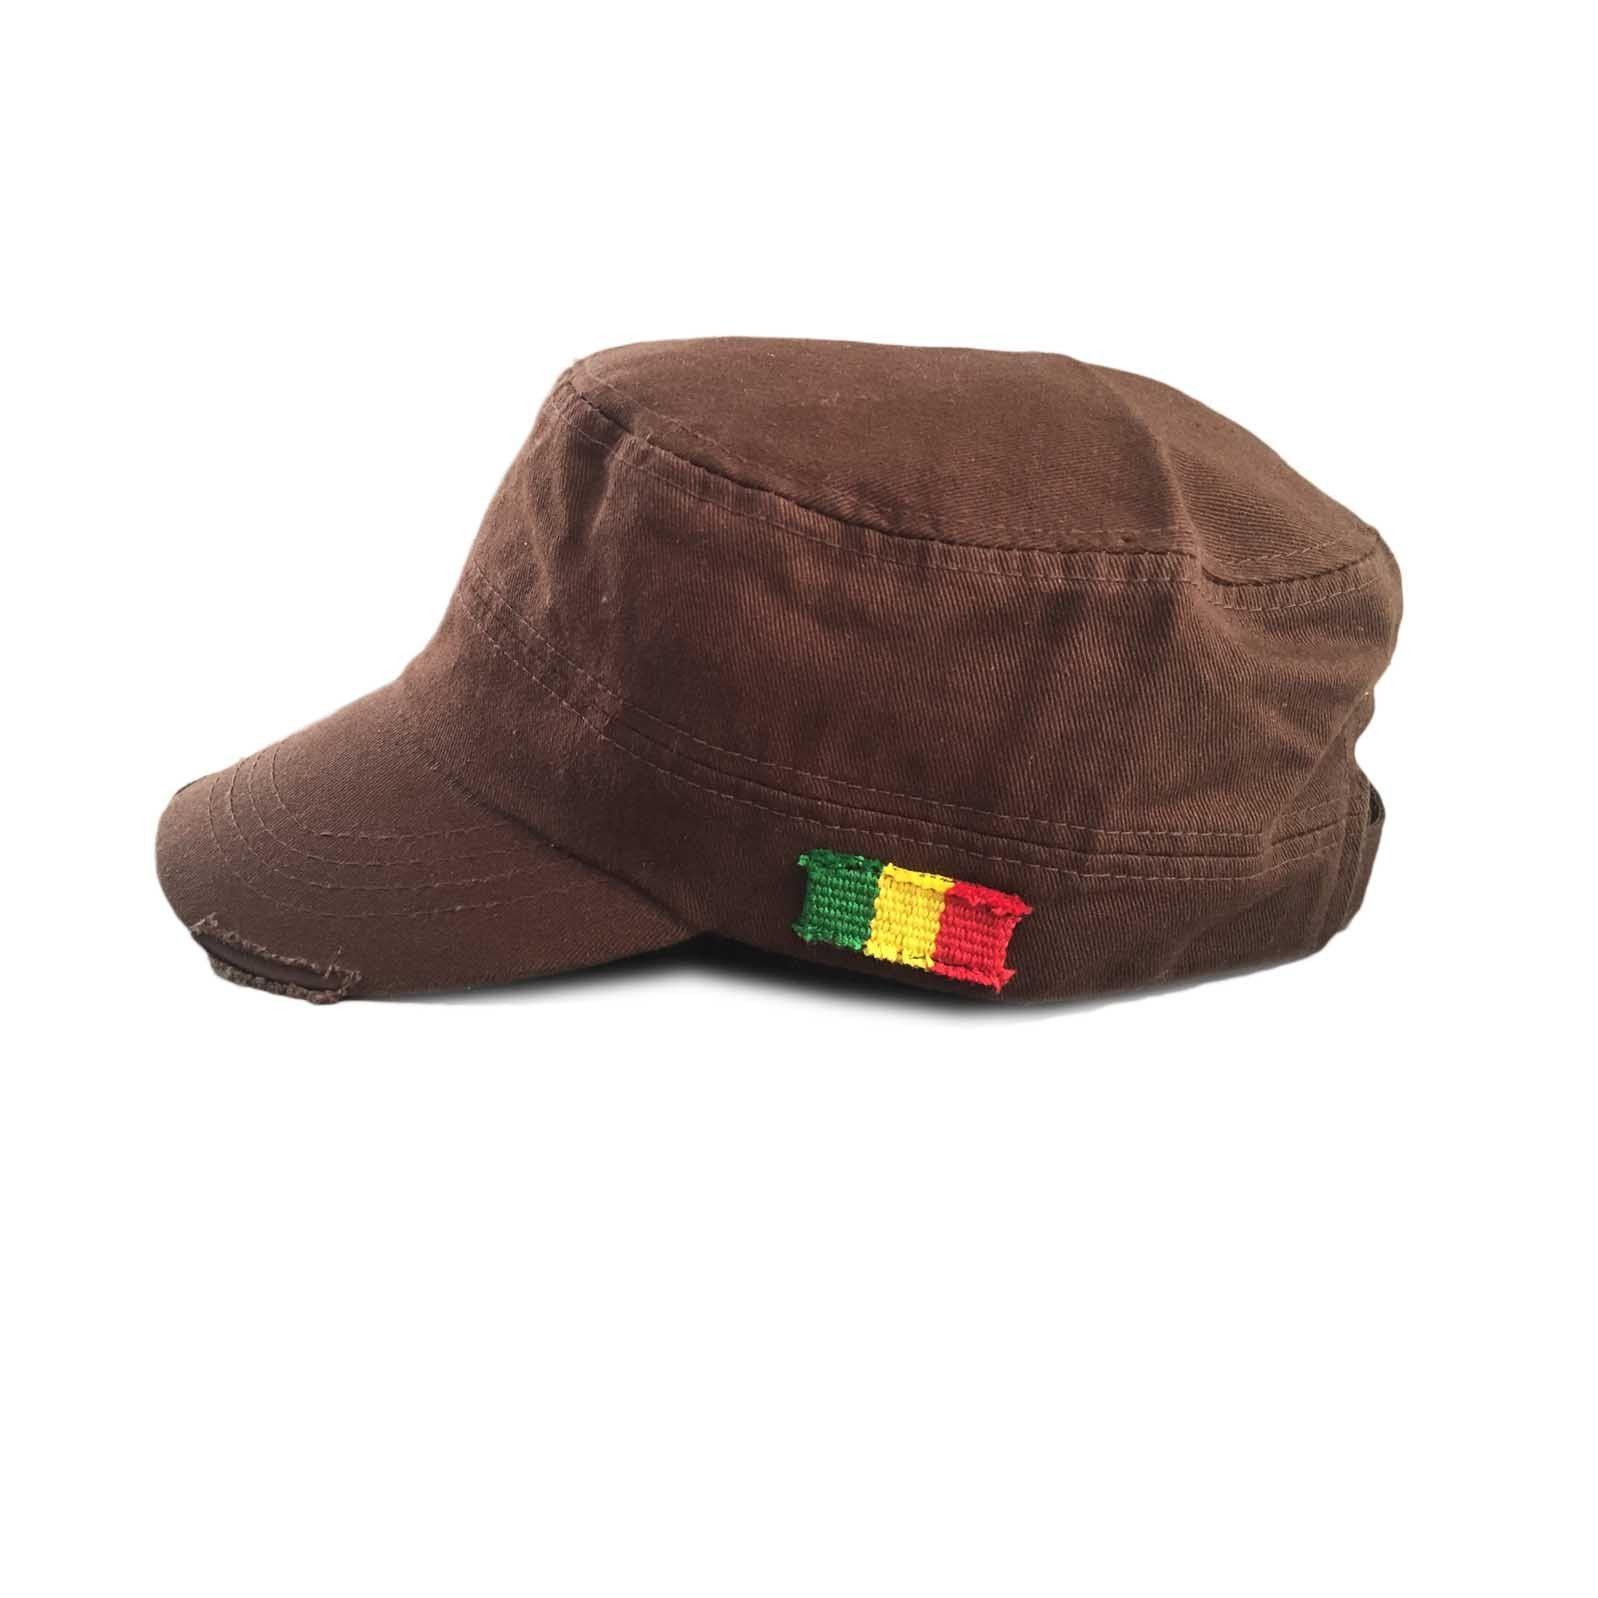 Rastacap Army Black Rasta Cap Cadet Military Style Hat Army Cap Castro 1sz  Fit 072503303fe